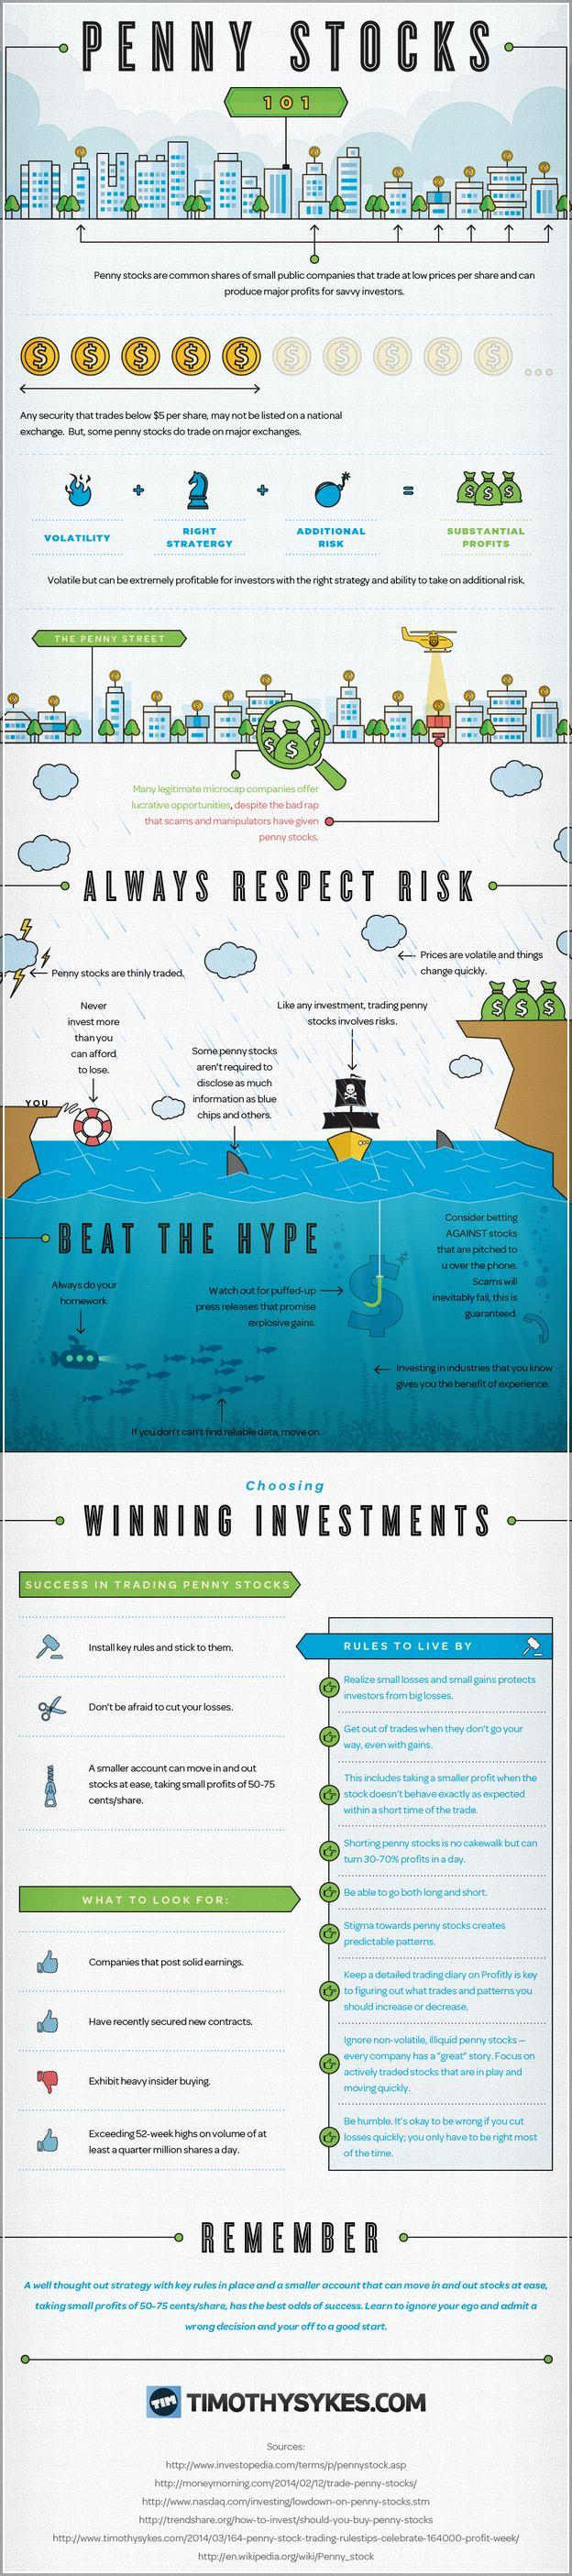 How To Trade Penny Stocks Pdf